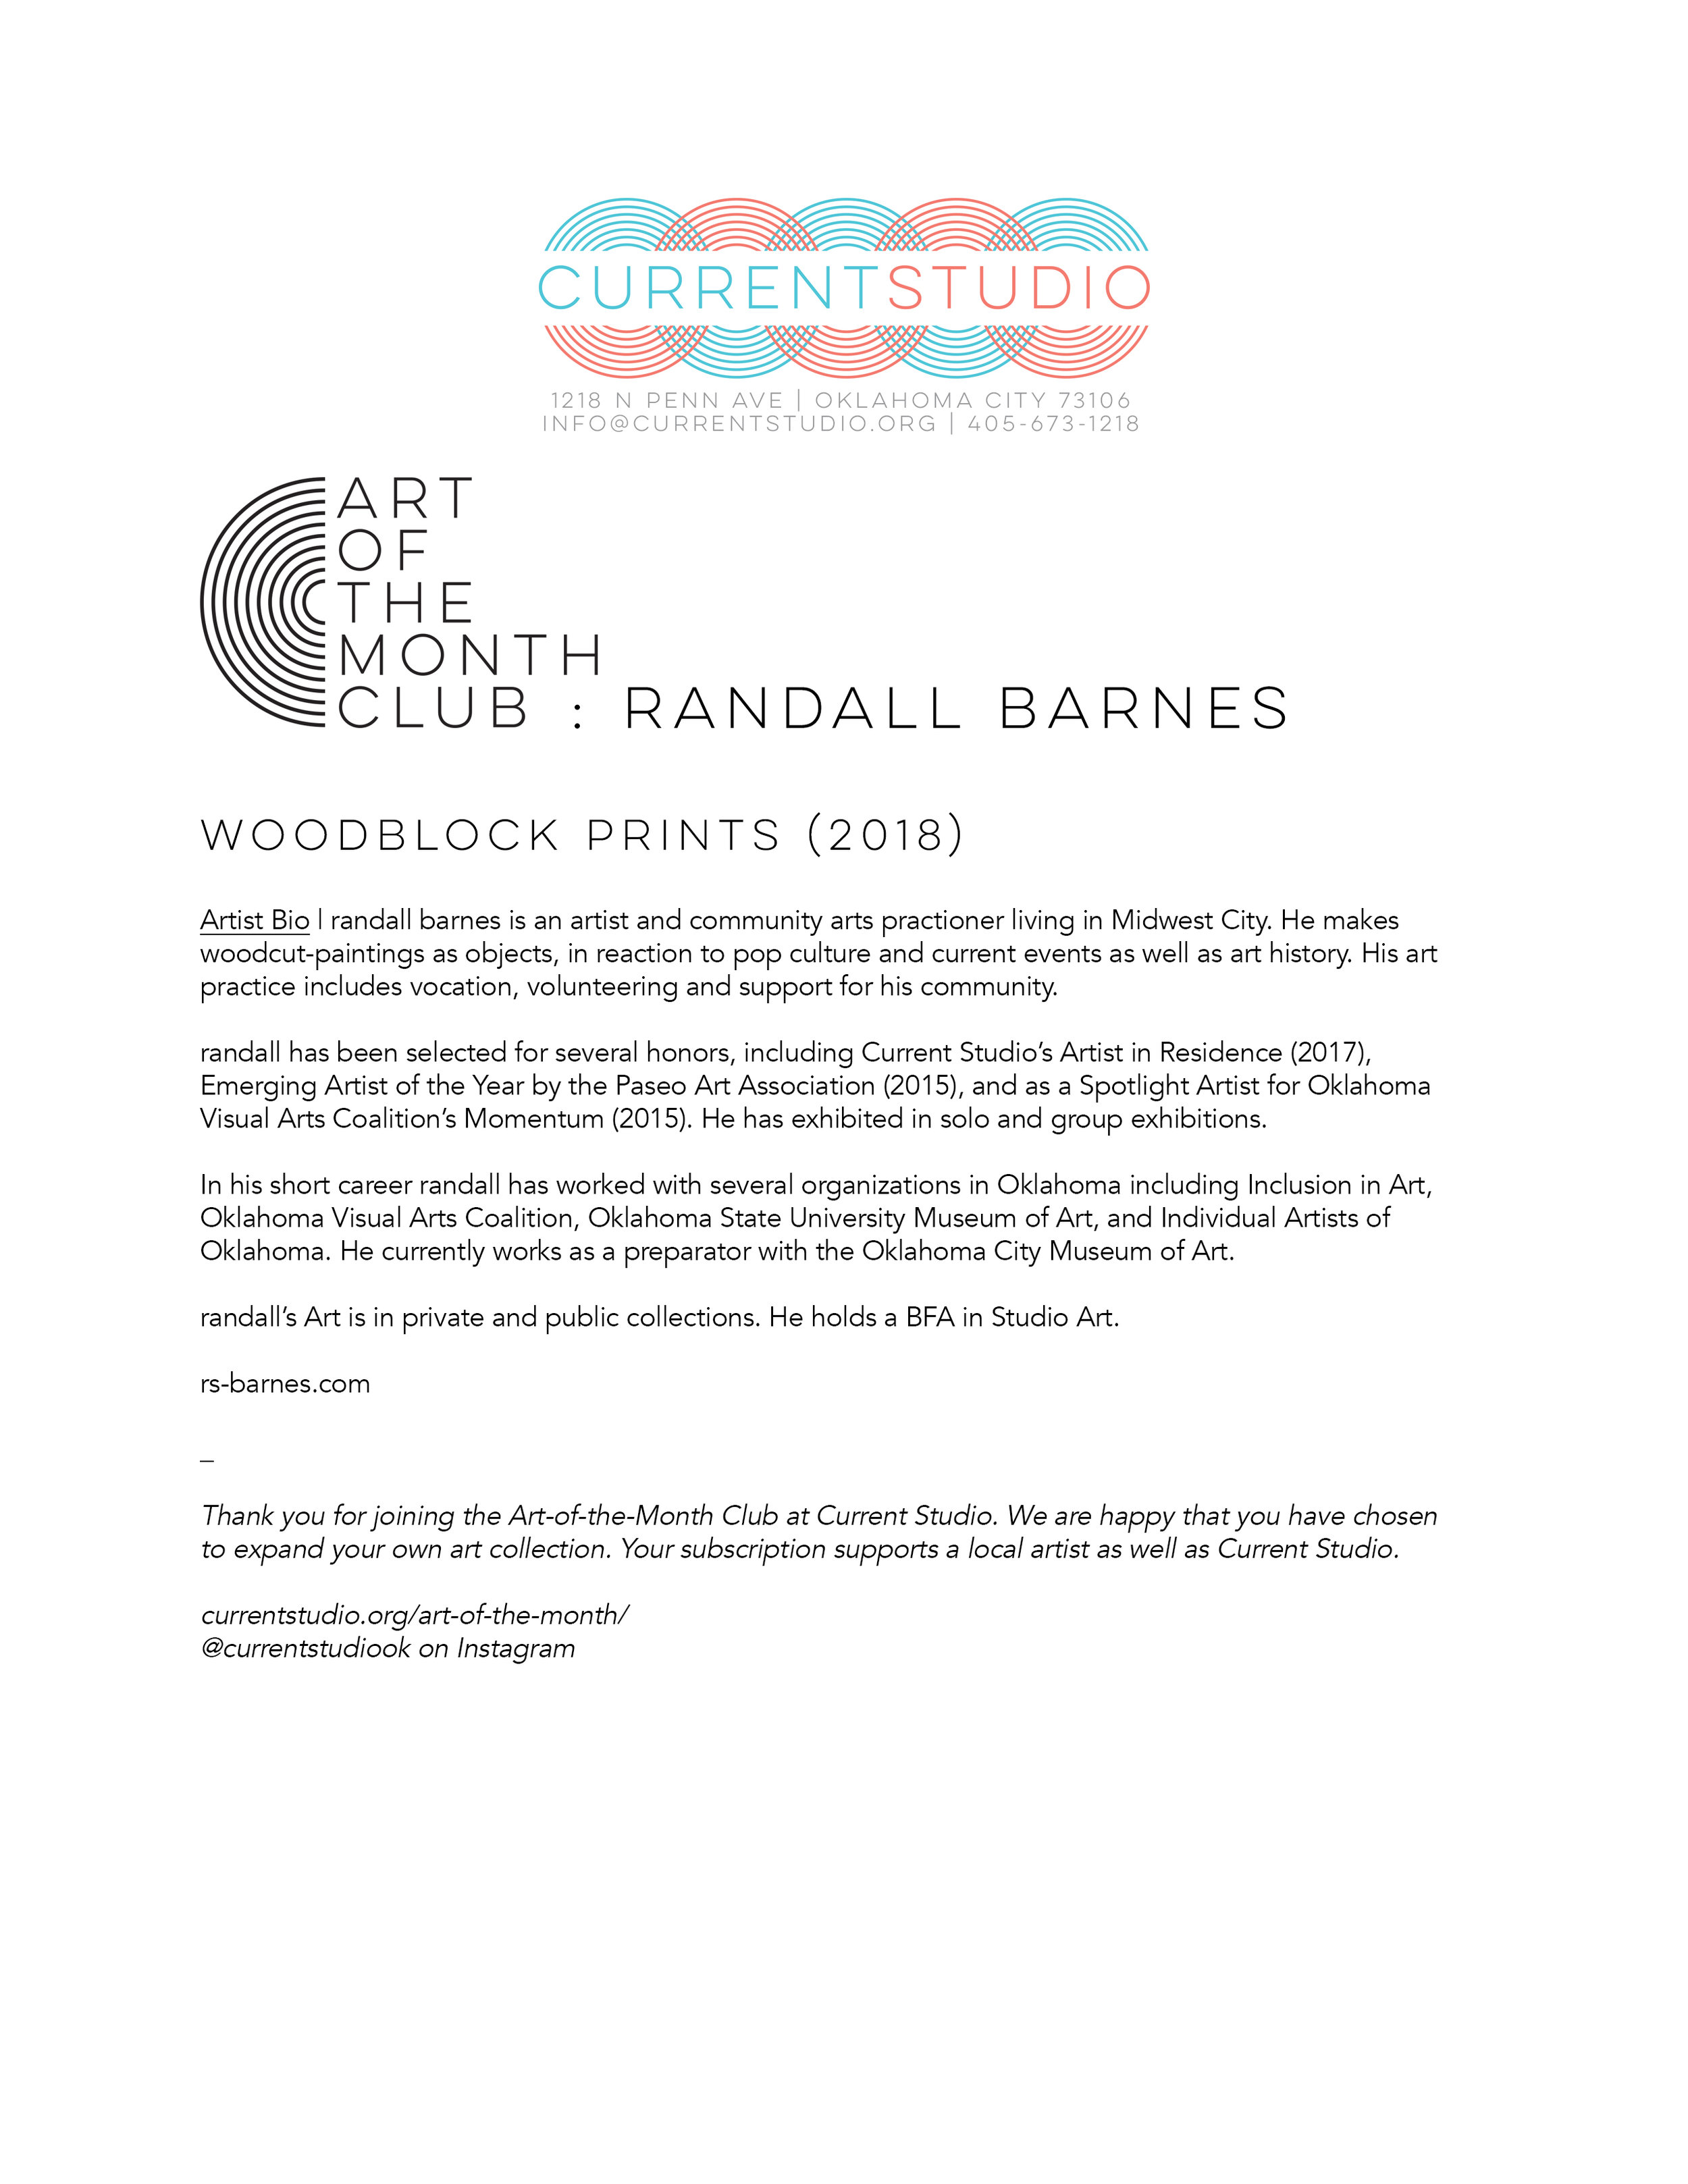 art of the month artist sheet - randall barnes.jpg